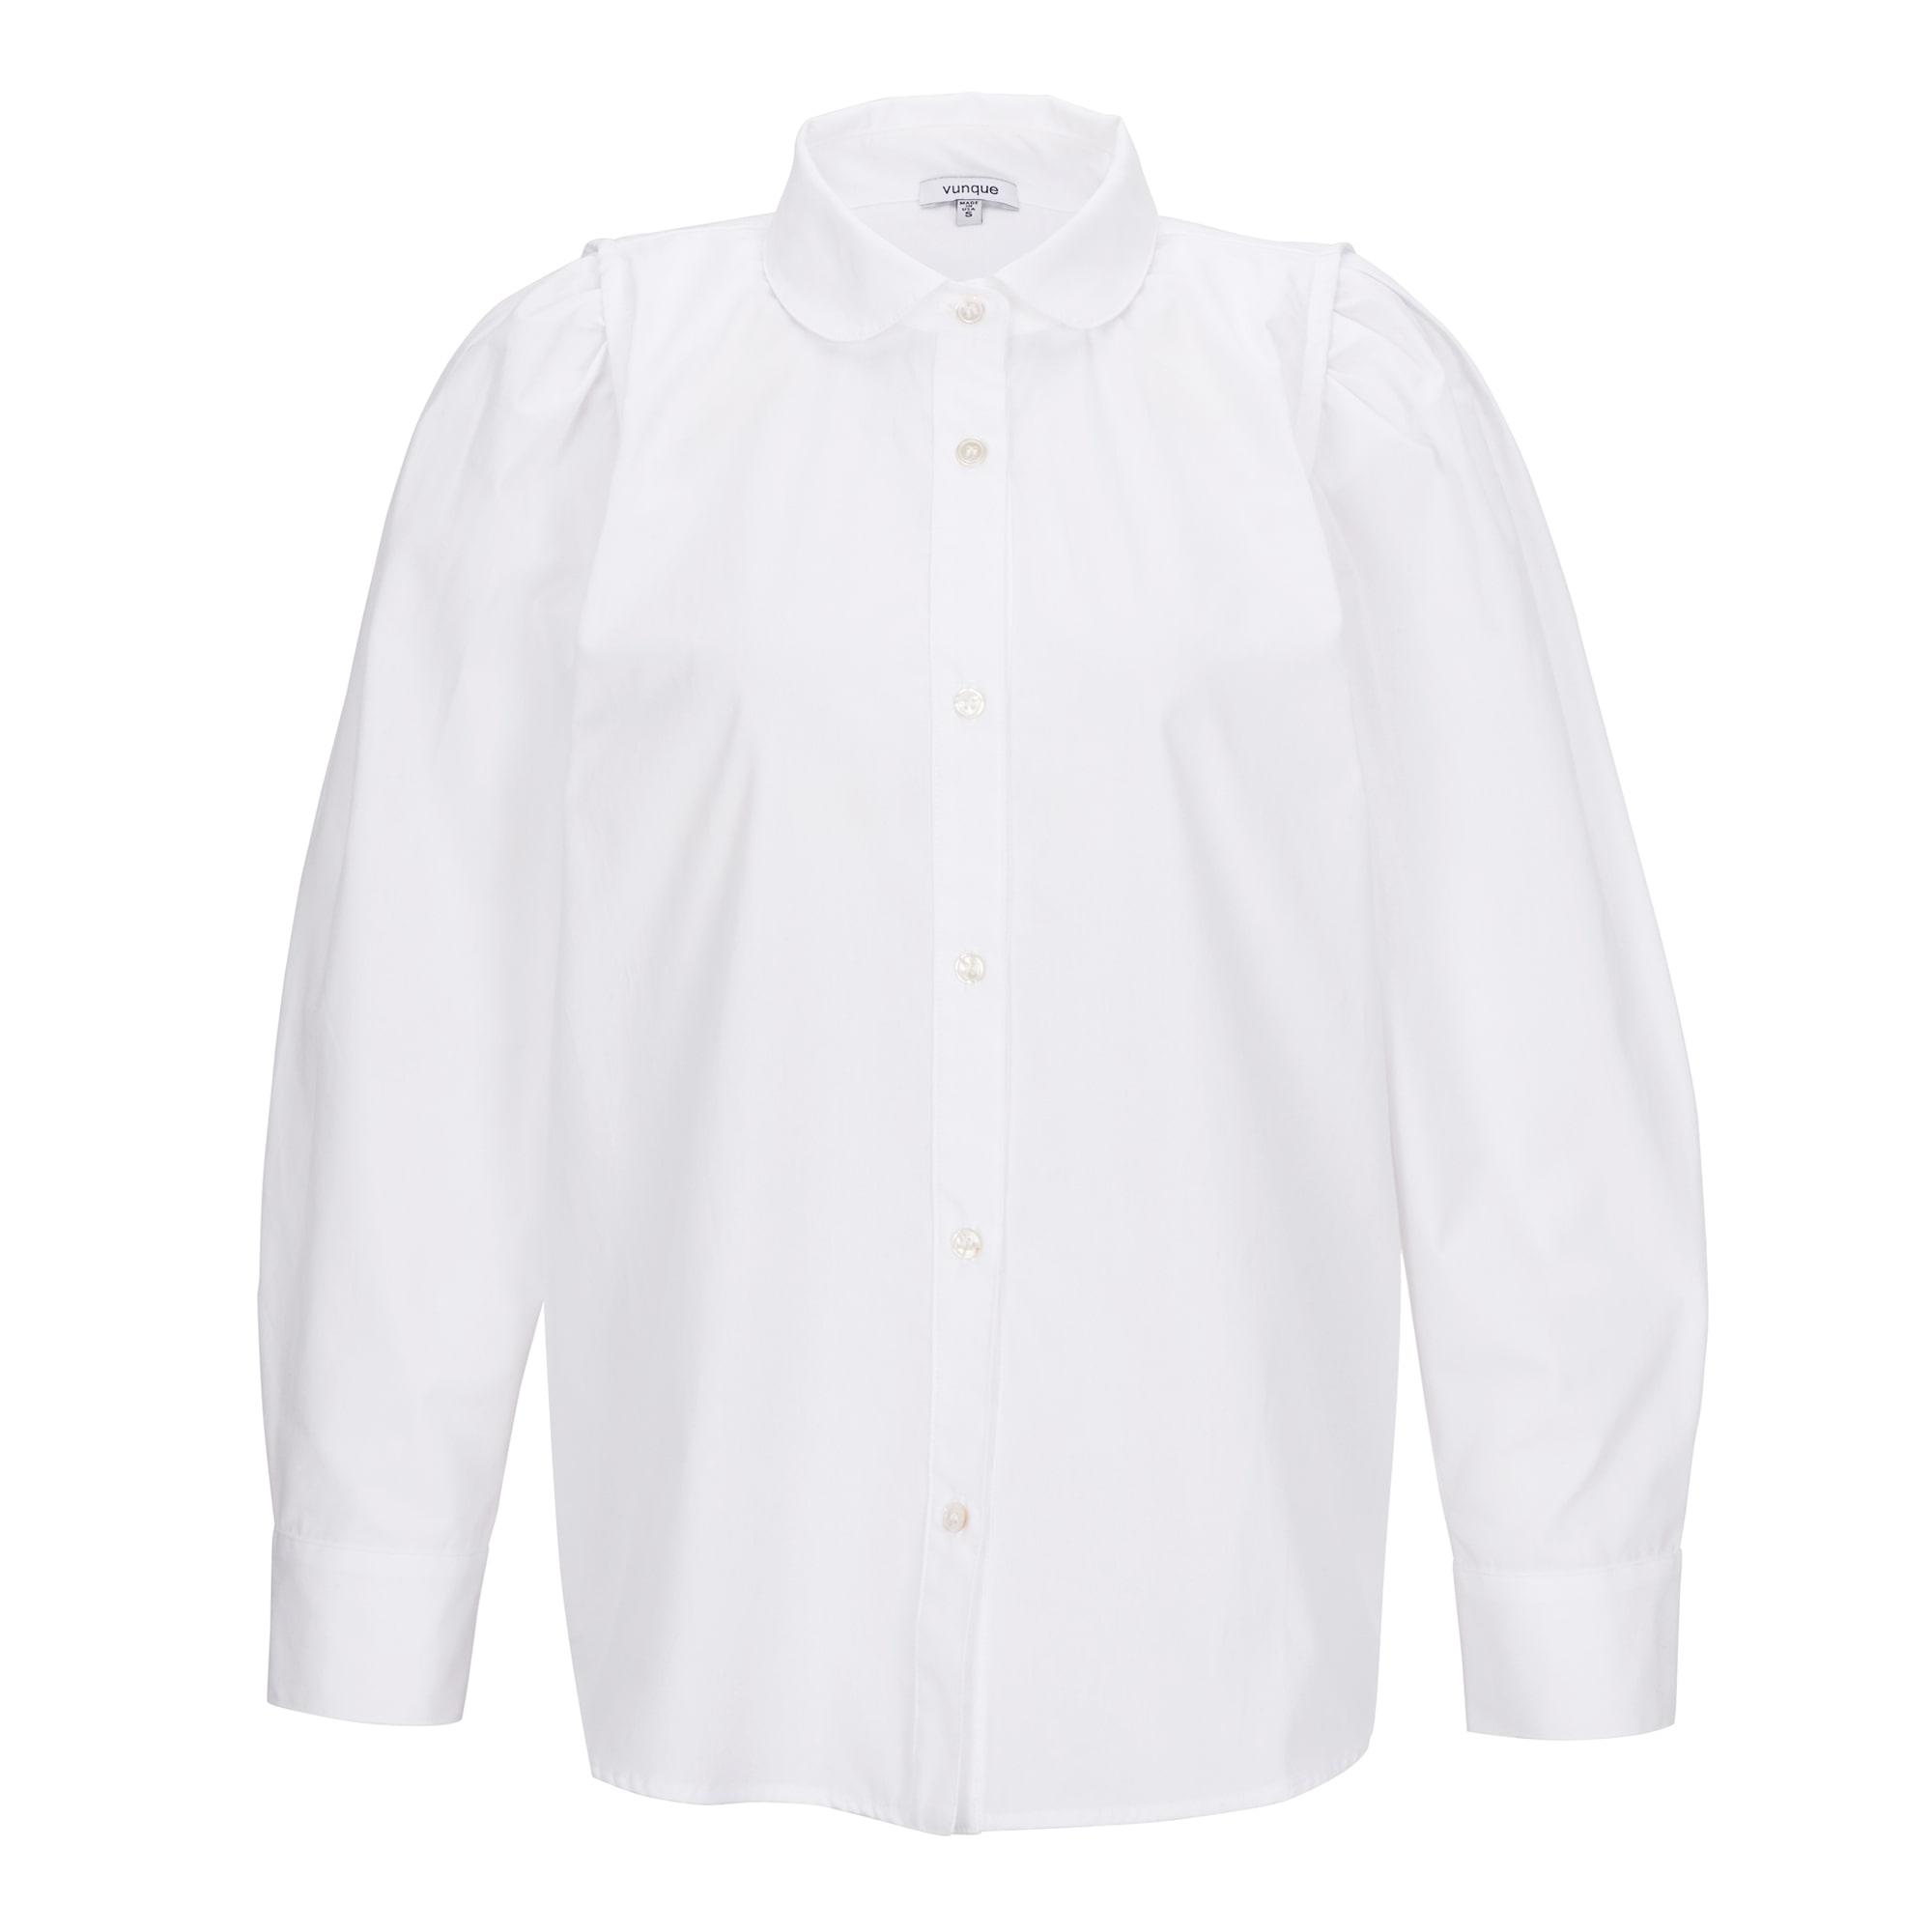 Humming double shoulder shirt (허밍 더블 숄더 셔츠) White